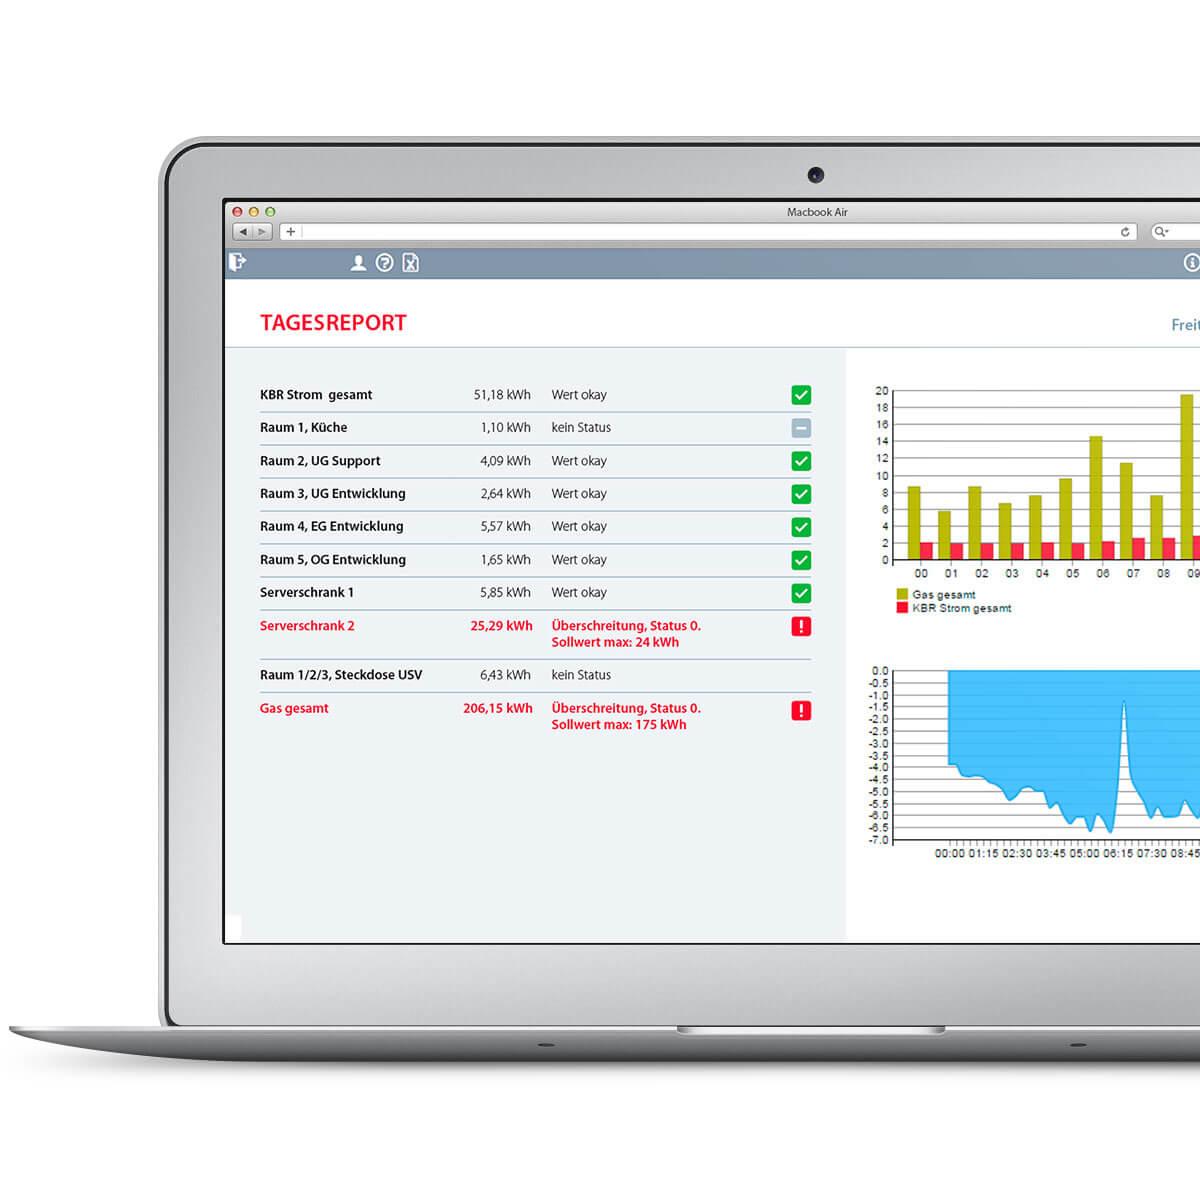 Grafik Energiepotenziale | Energiemanagementsystem ISO 50001 visual energy